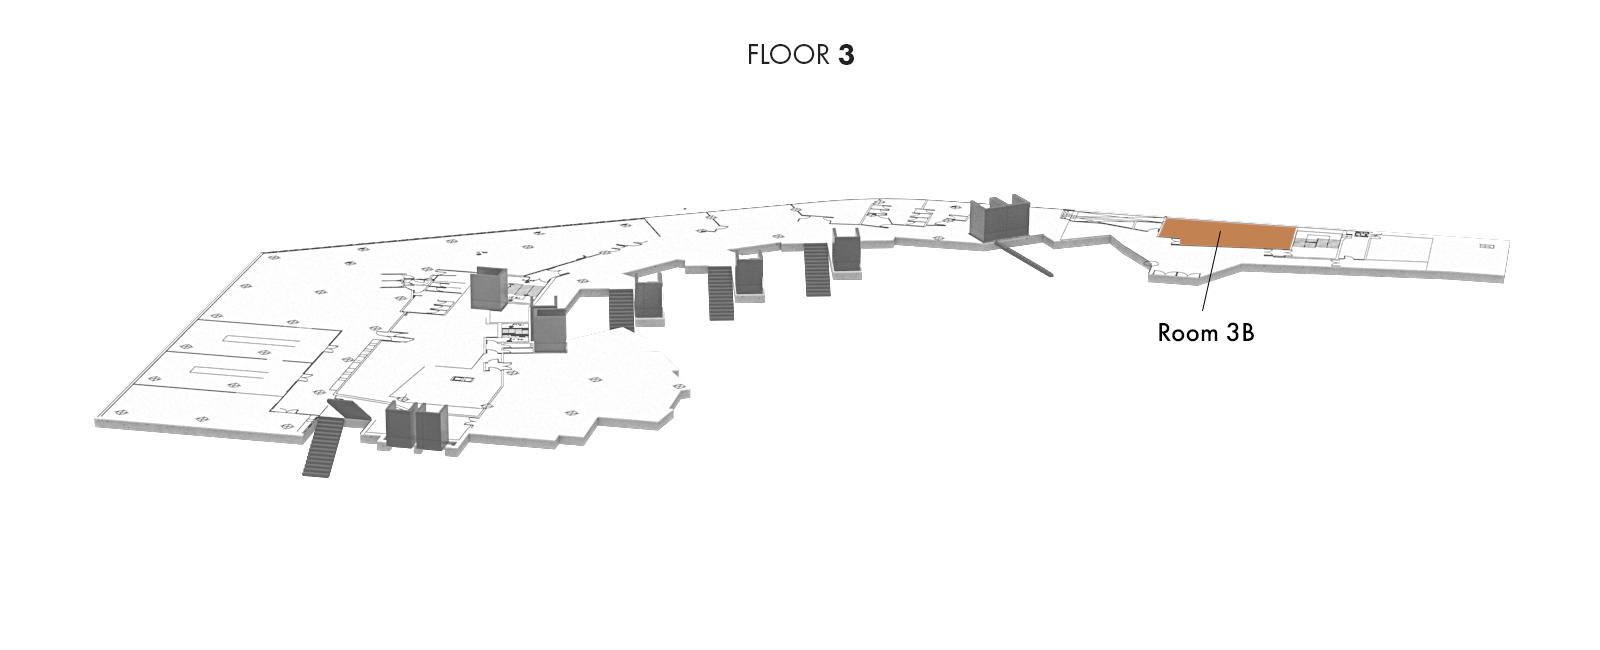 Room 3B, Floor 3   Palacio Euskalduna Jauregia